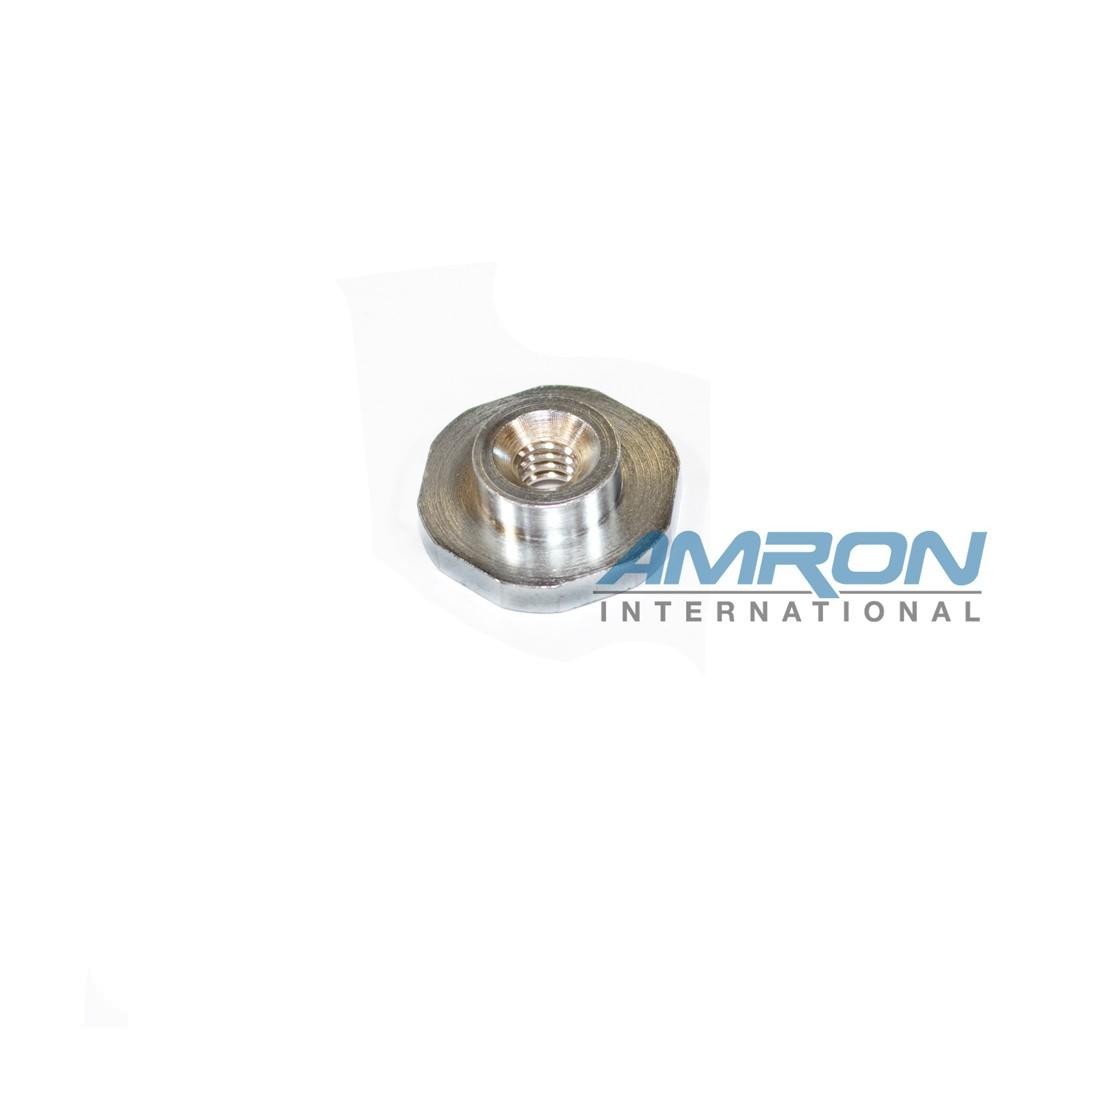 Kirby Morgan 550-113 Adjustment Nut